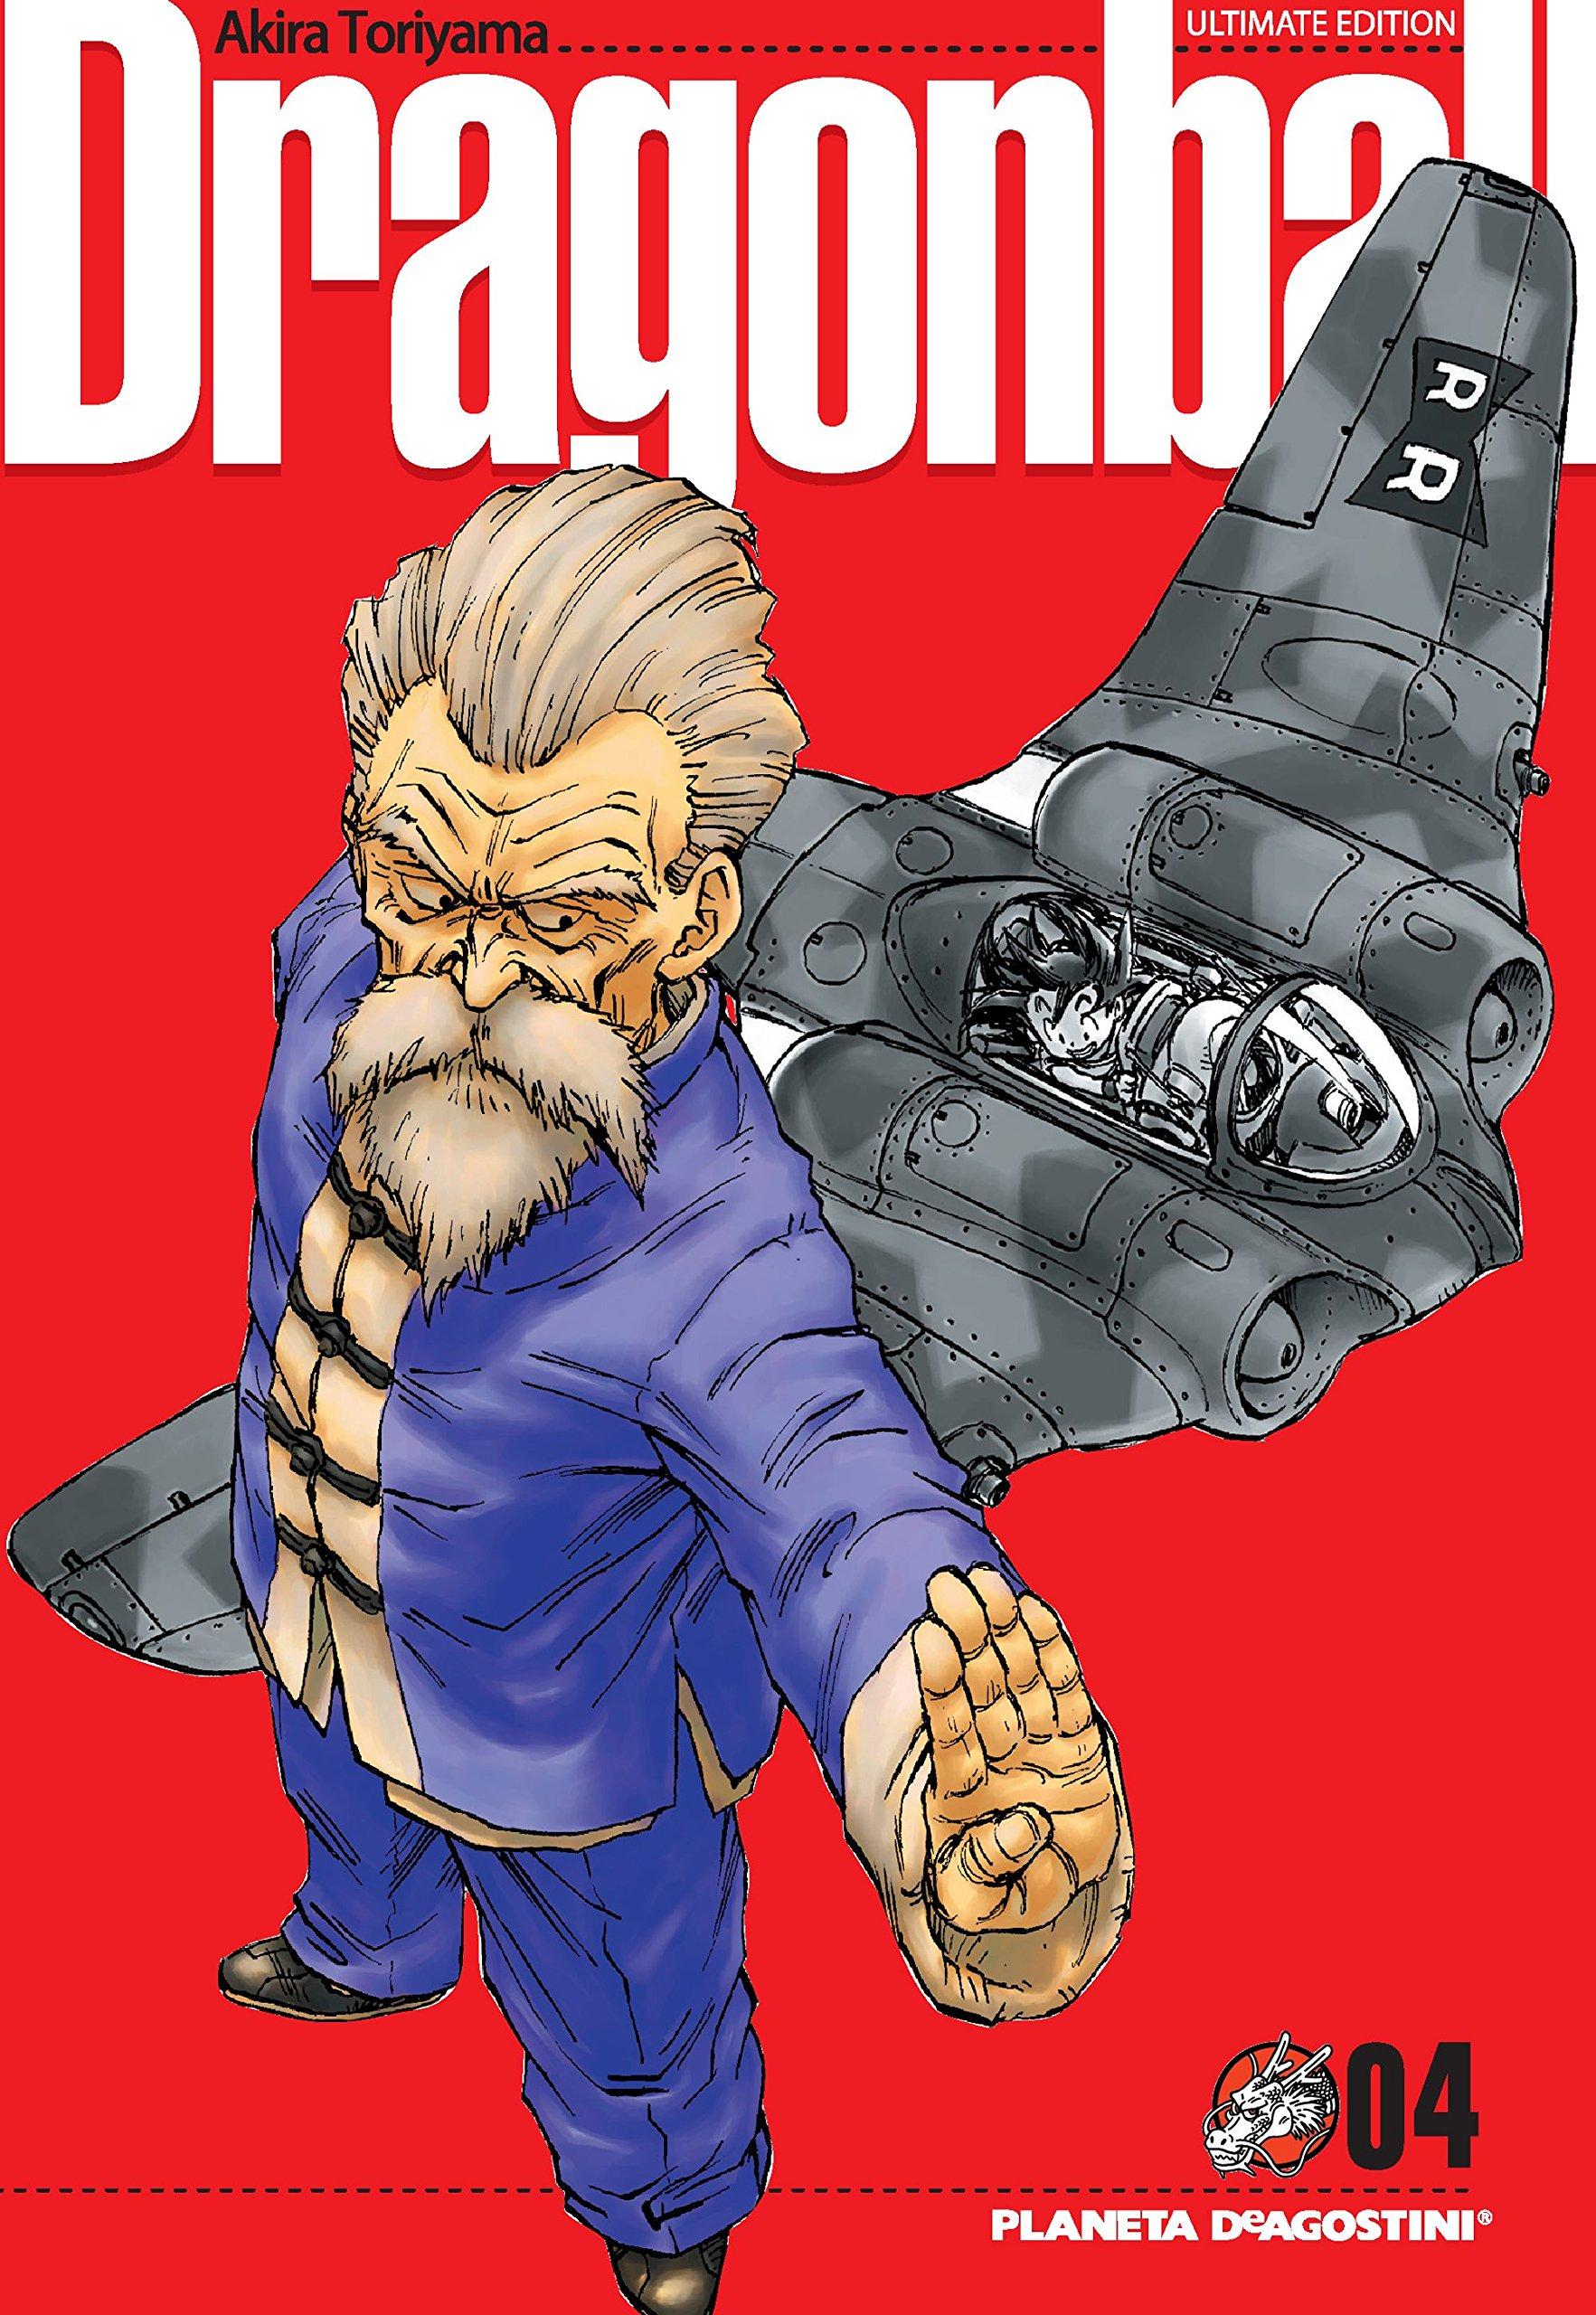 Dragon Ball nº 04/34 (Manga Shonen) Tapa blanda – 9 oct 2007 Akira Toriyama Planeta DeAgostini Cómics 8468470376 Cómics y novelas gráficas